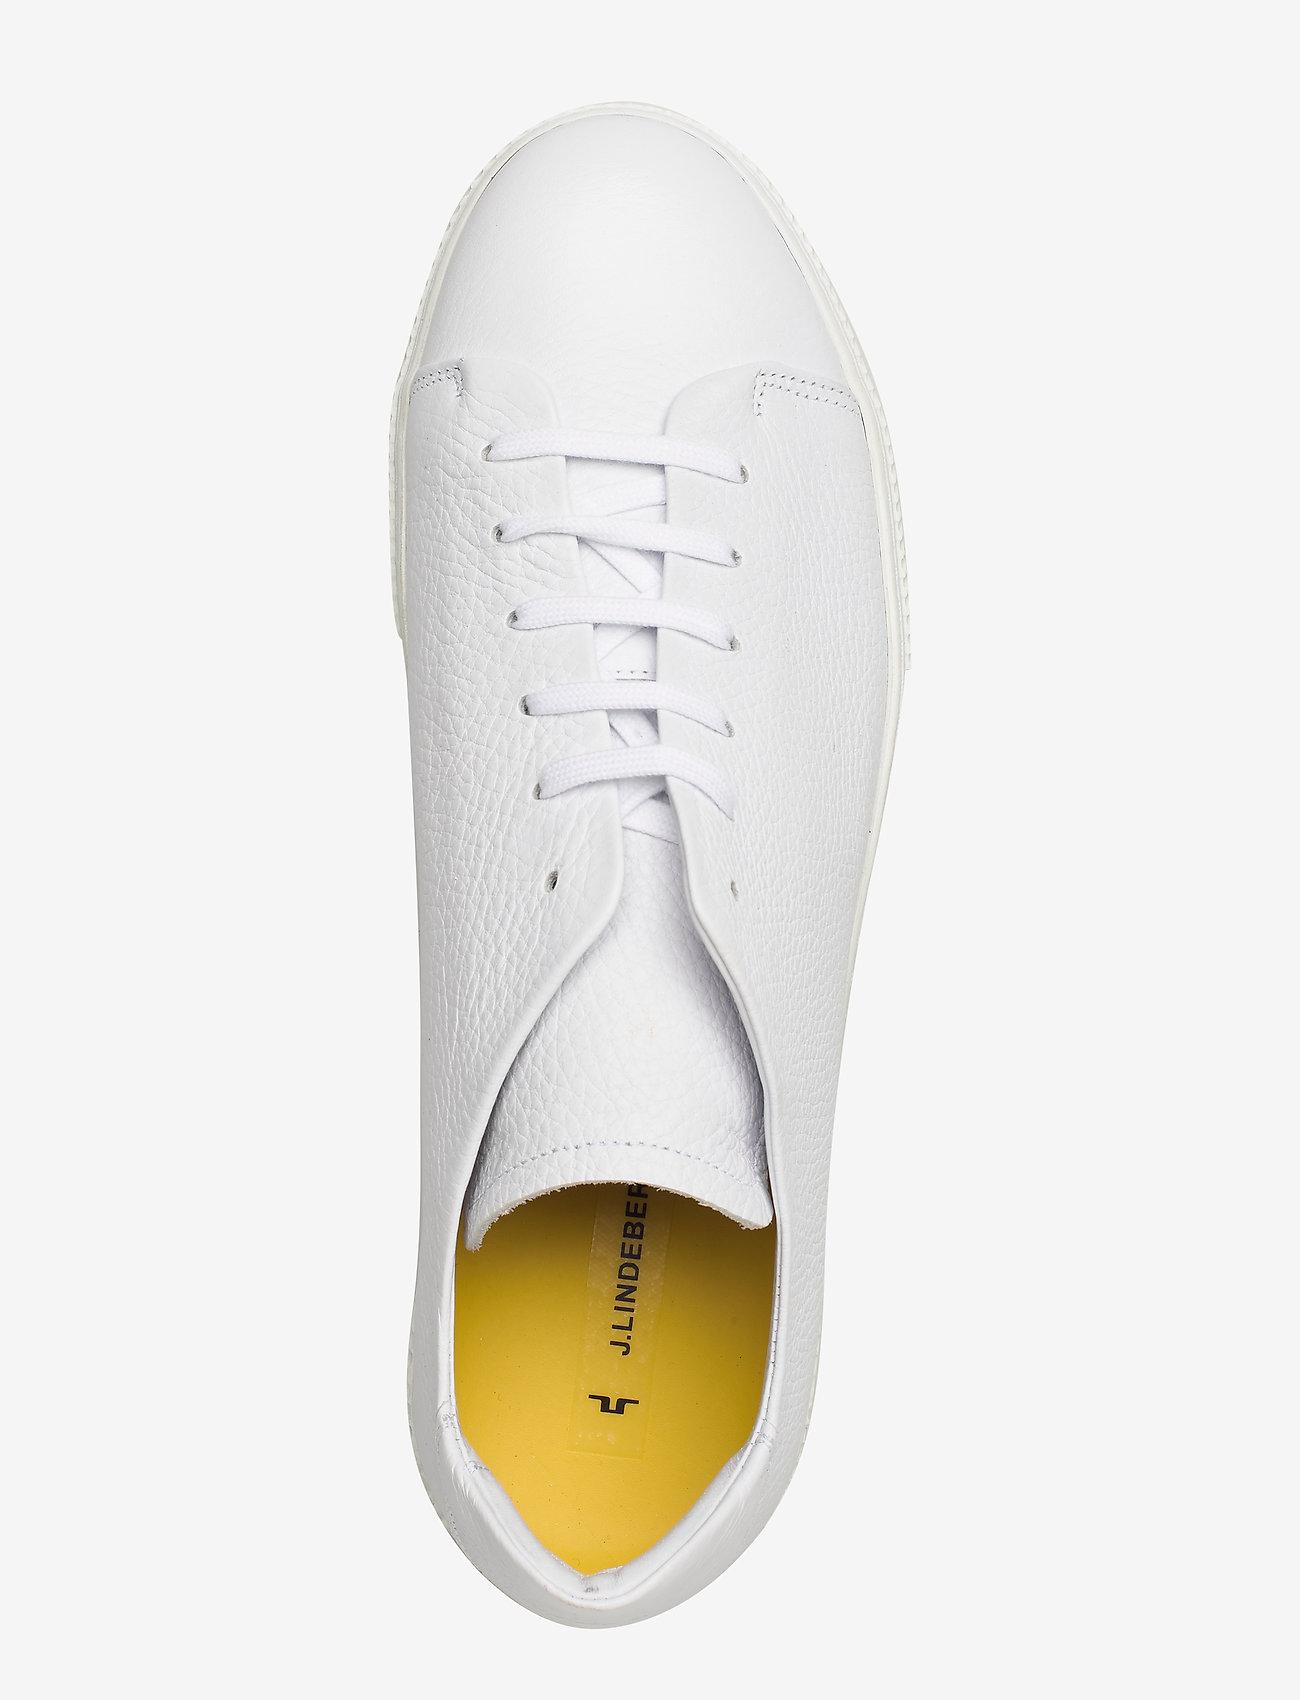 Sneaker Lt Clean-leather Grain (White) - J. Lindeberg